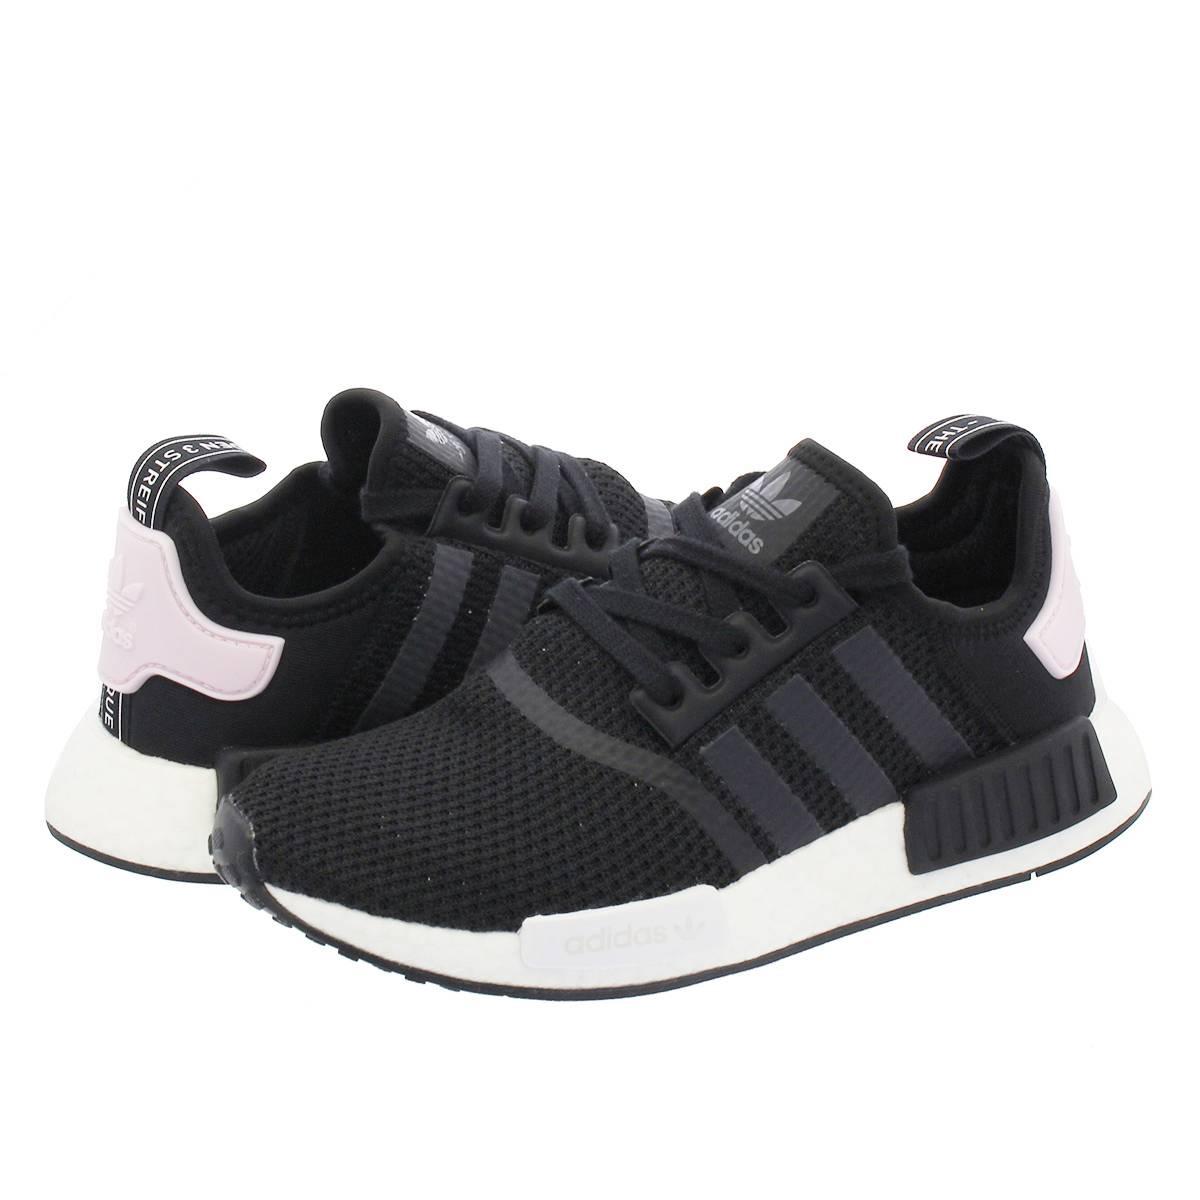 quality design 79168 15935 adidas NMD_R1 W Adidas NMD_R1 women CORE BLACK/RUNNING WHITE/CLEAR PINK  b37649